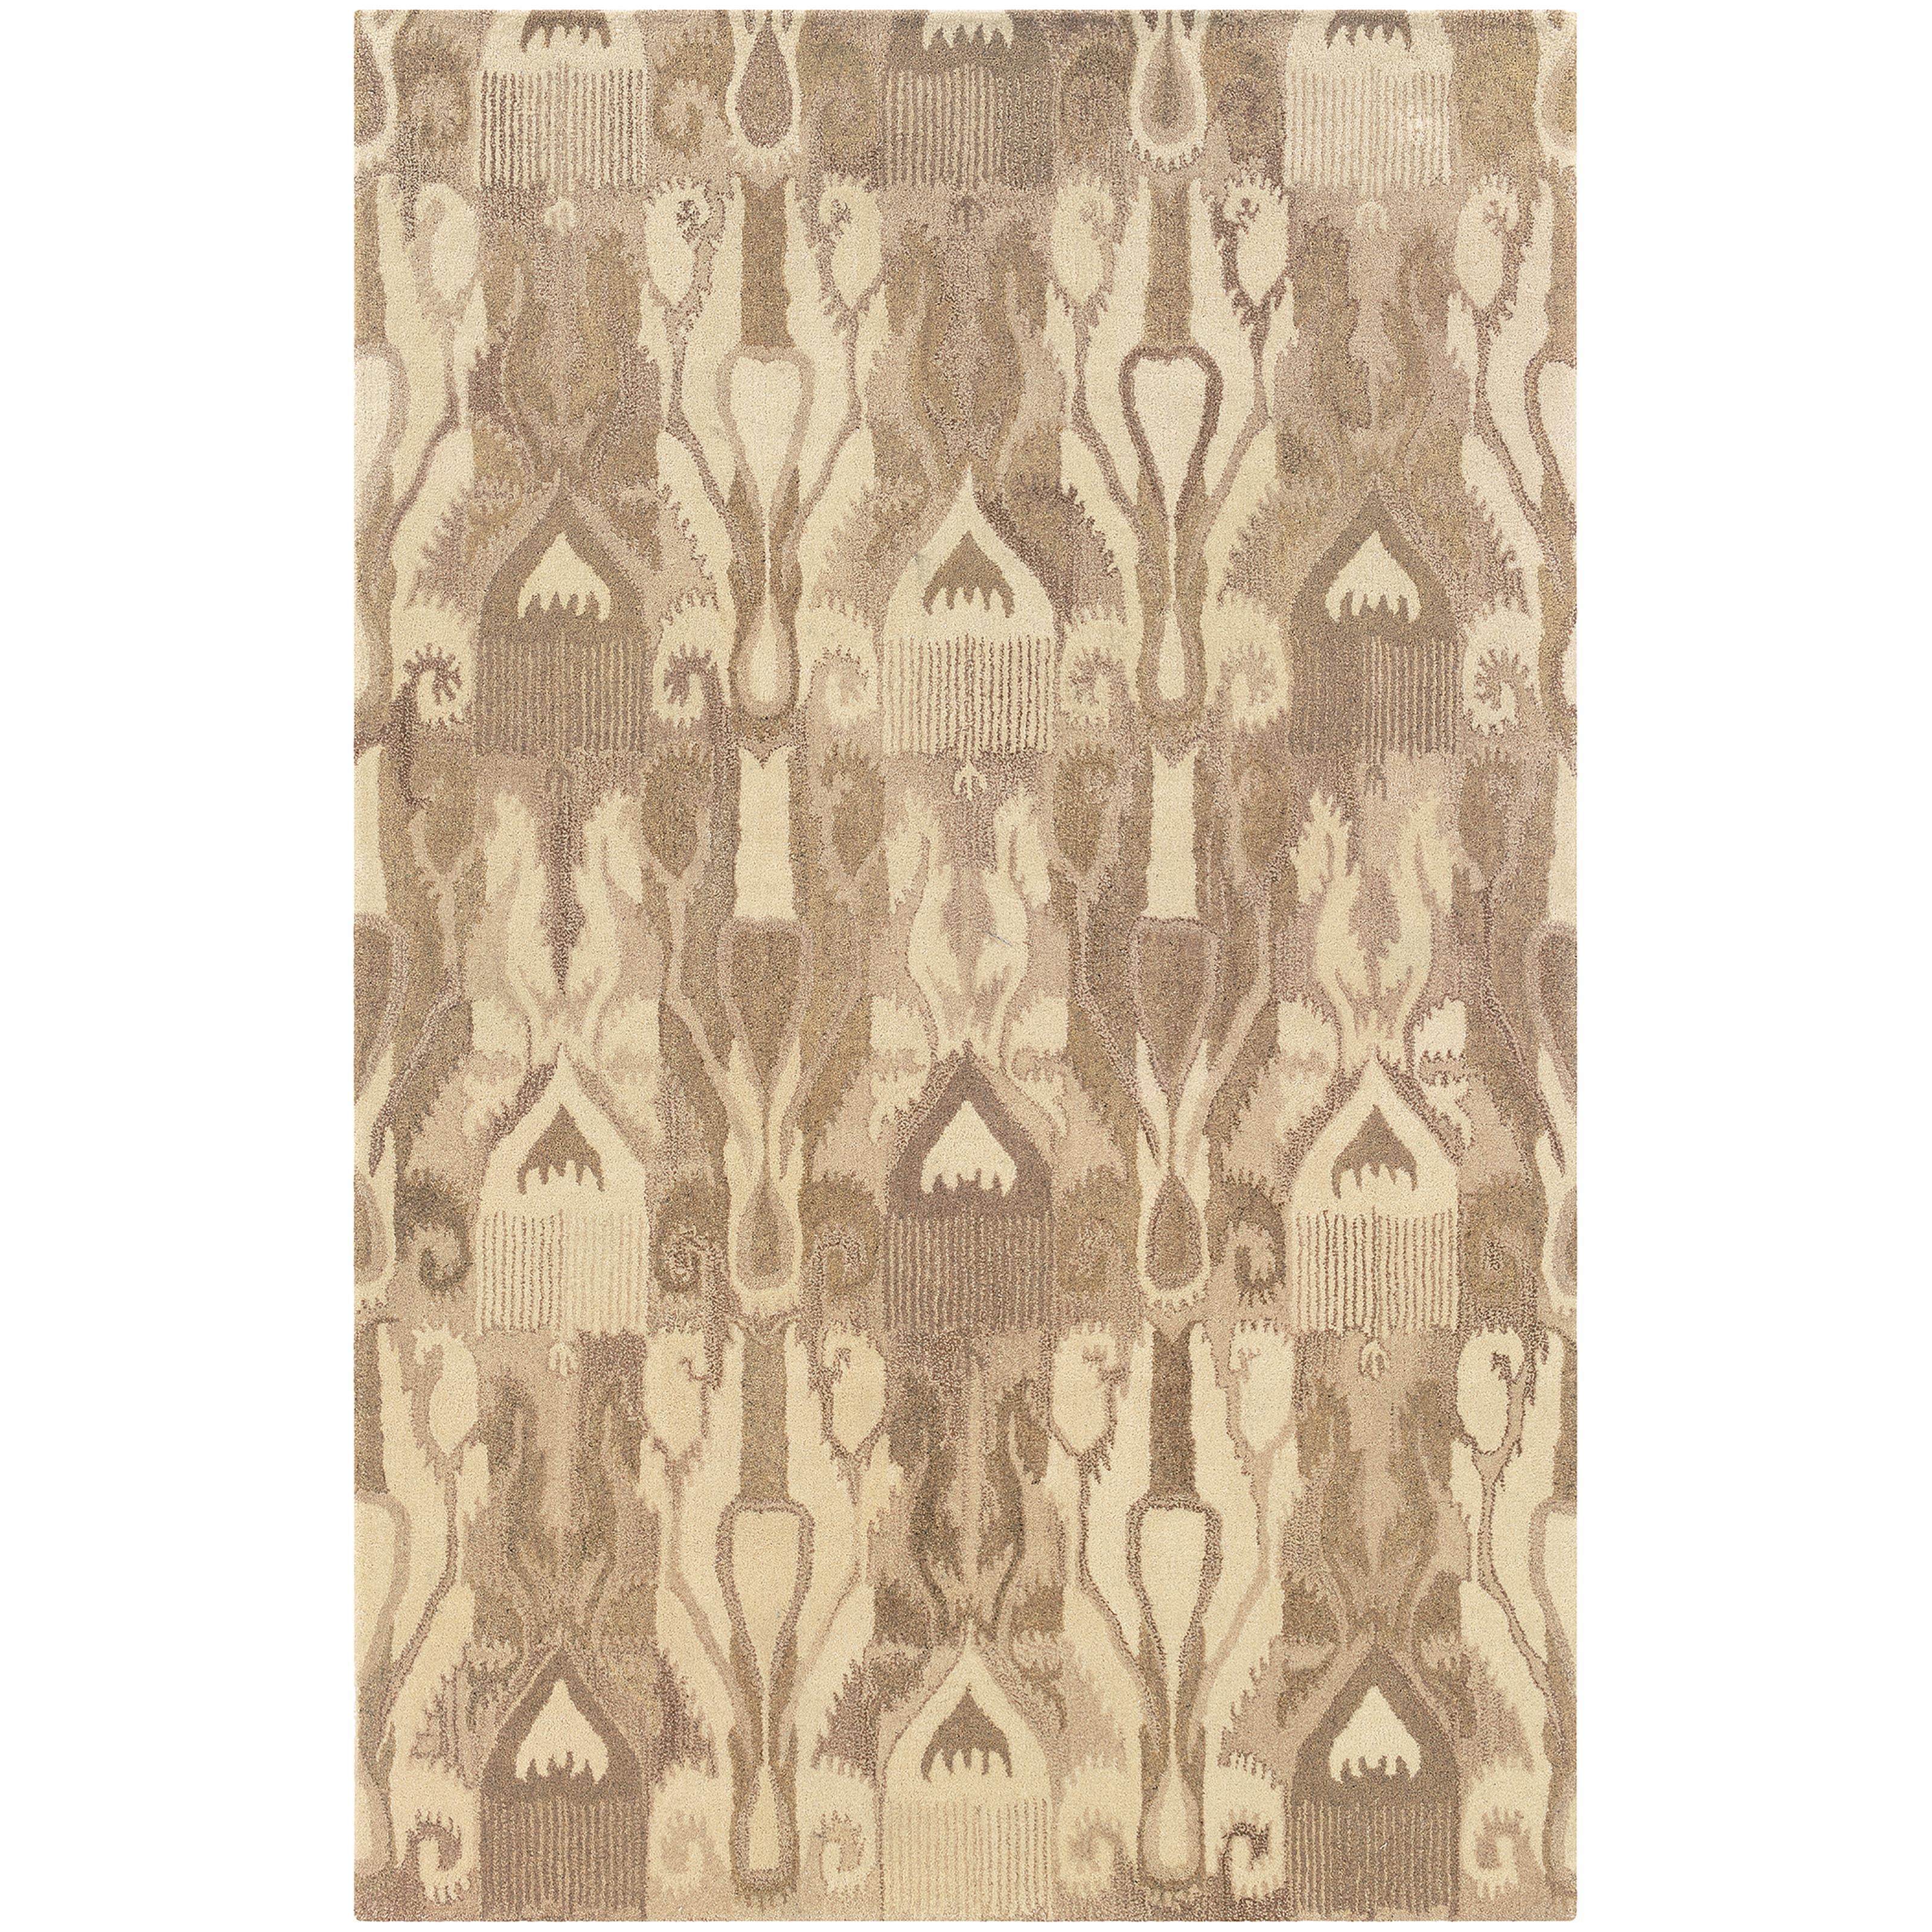 "Oriental Weavers Anastasia 8' 0"" X 10' 0"" Rug - Item Number: A68005244305ST"